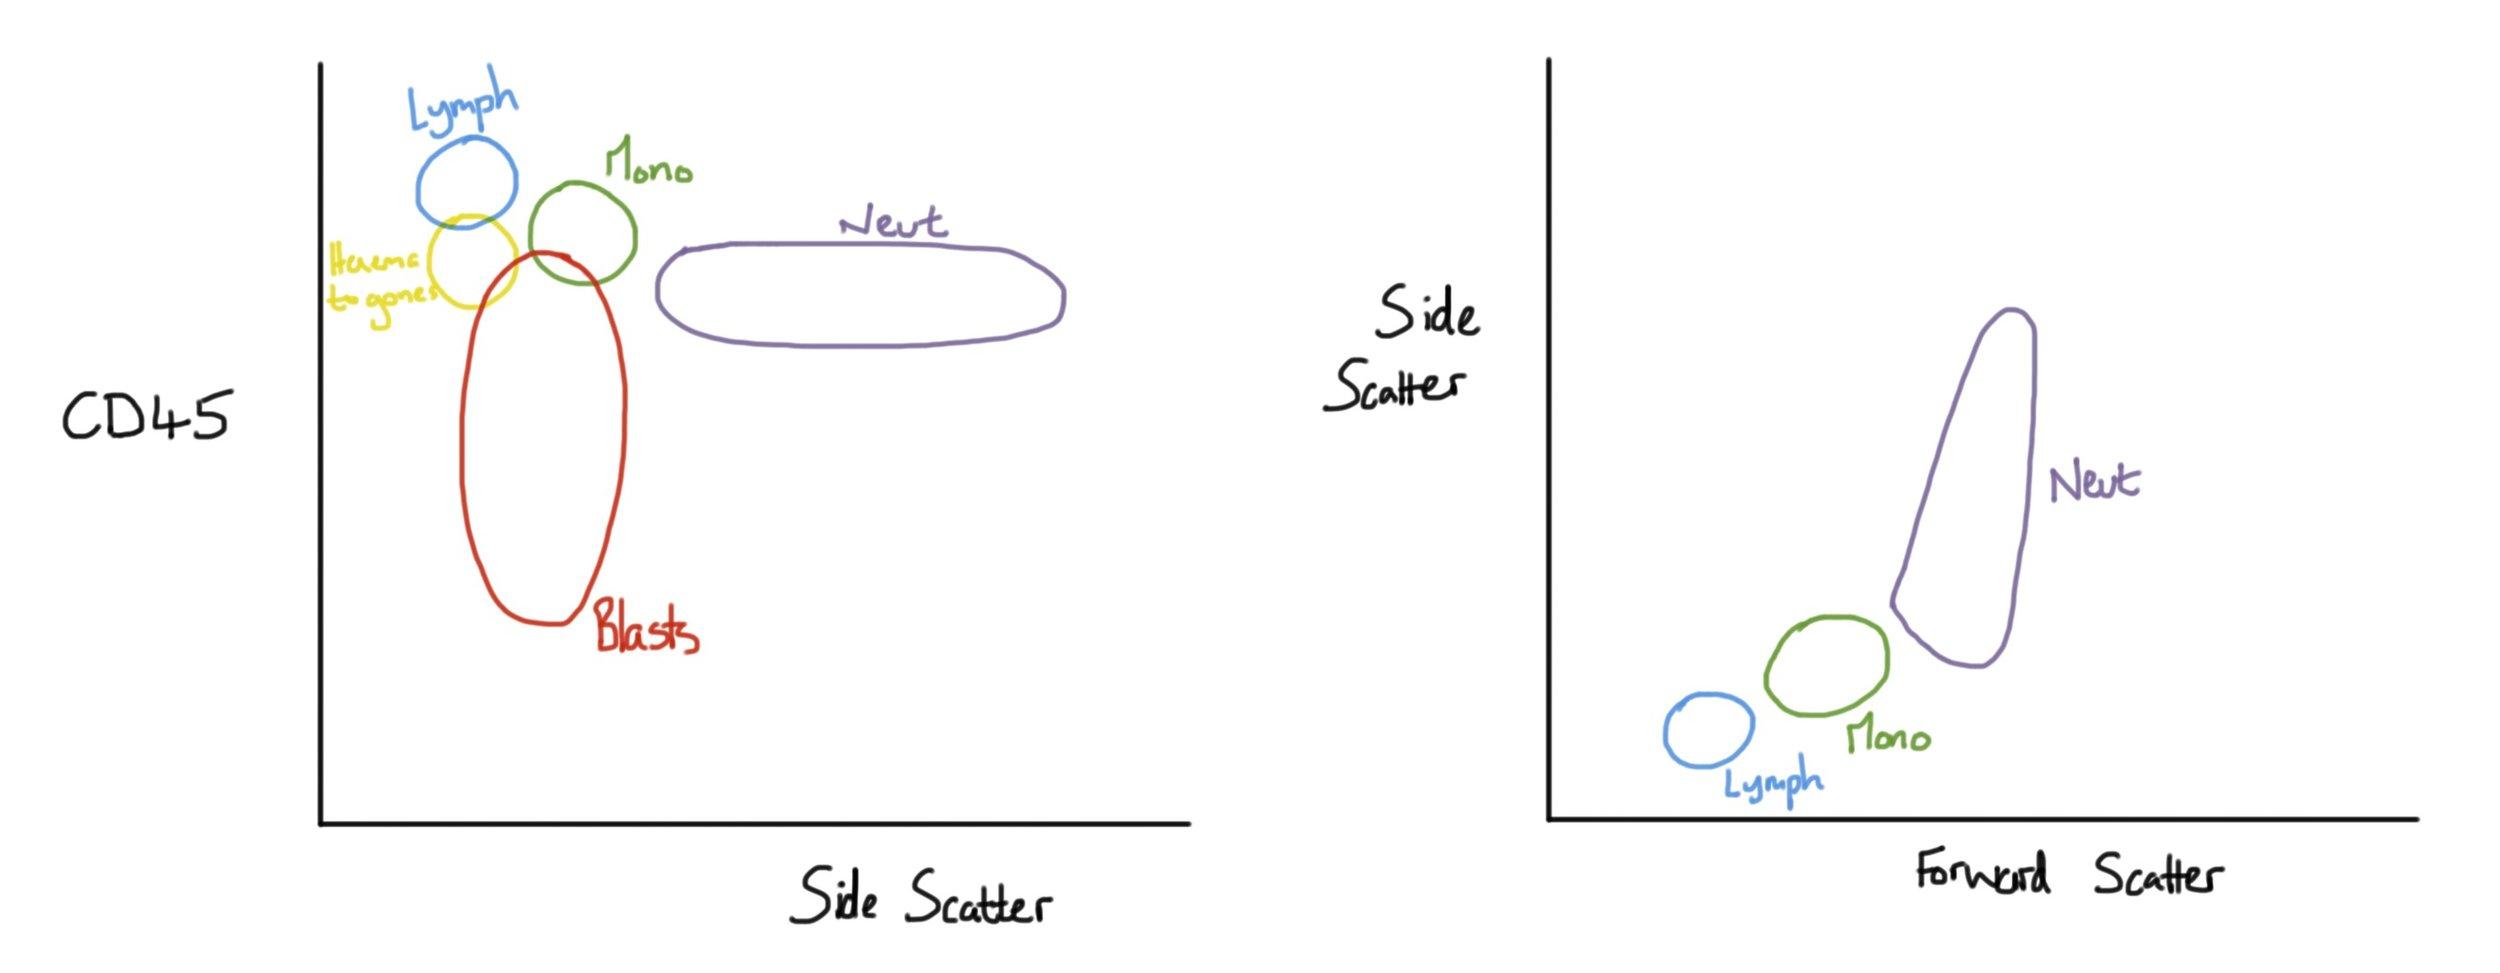 Normal flow charts1.jpg